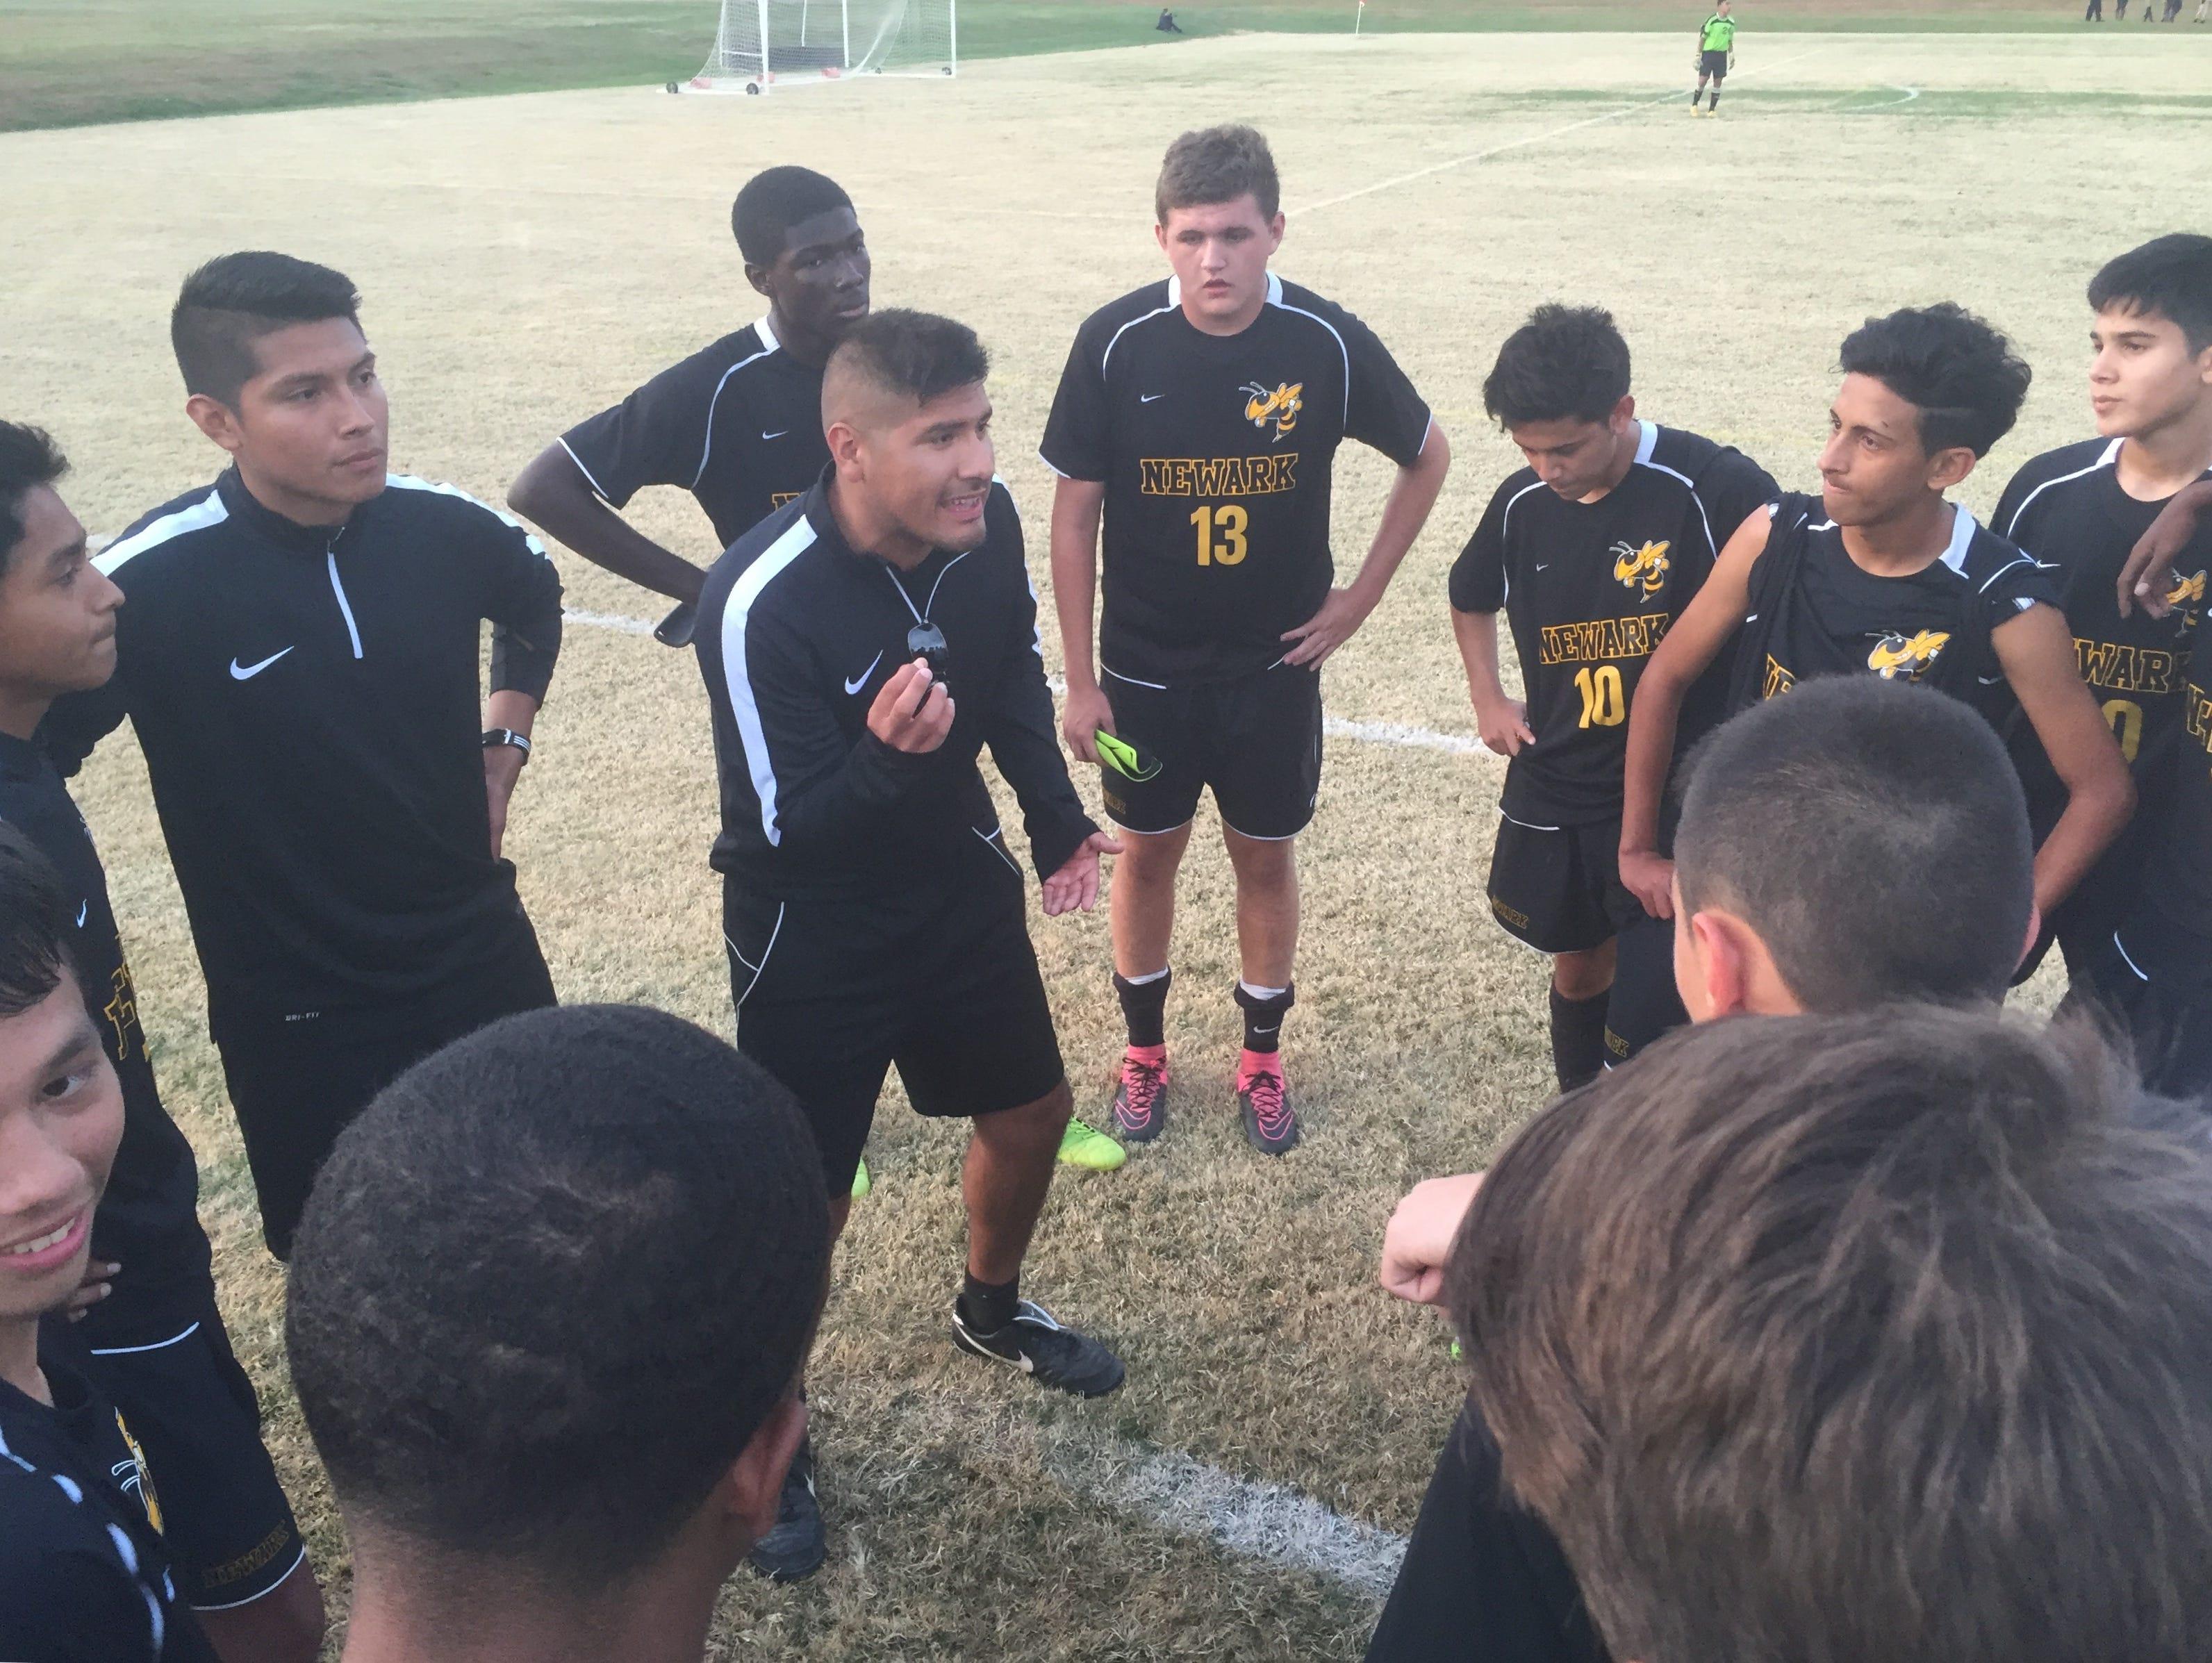 Newark boys soccer coach Diego Ruiz congratulates his team after a 2-1, double-overtime win at Delcastle on Thursday.